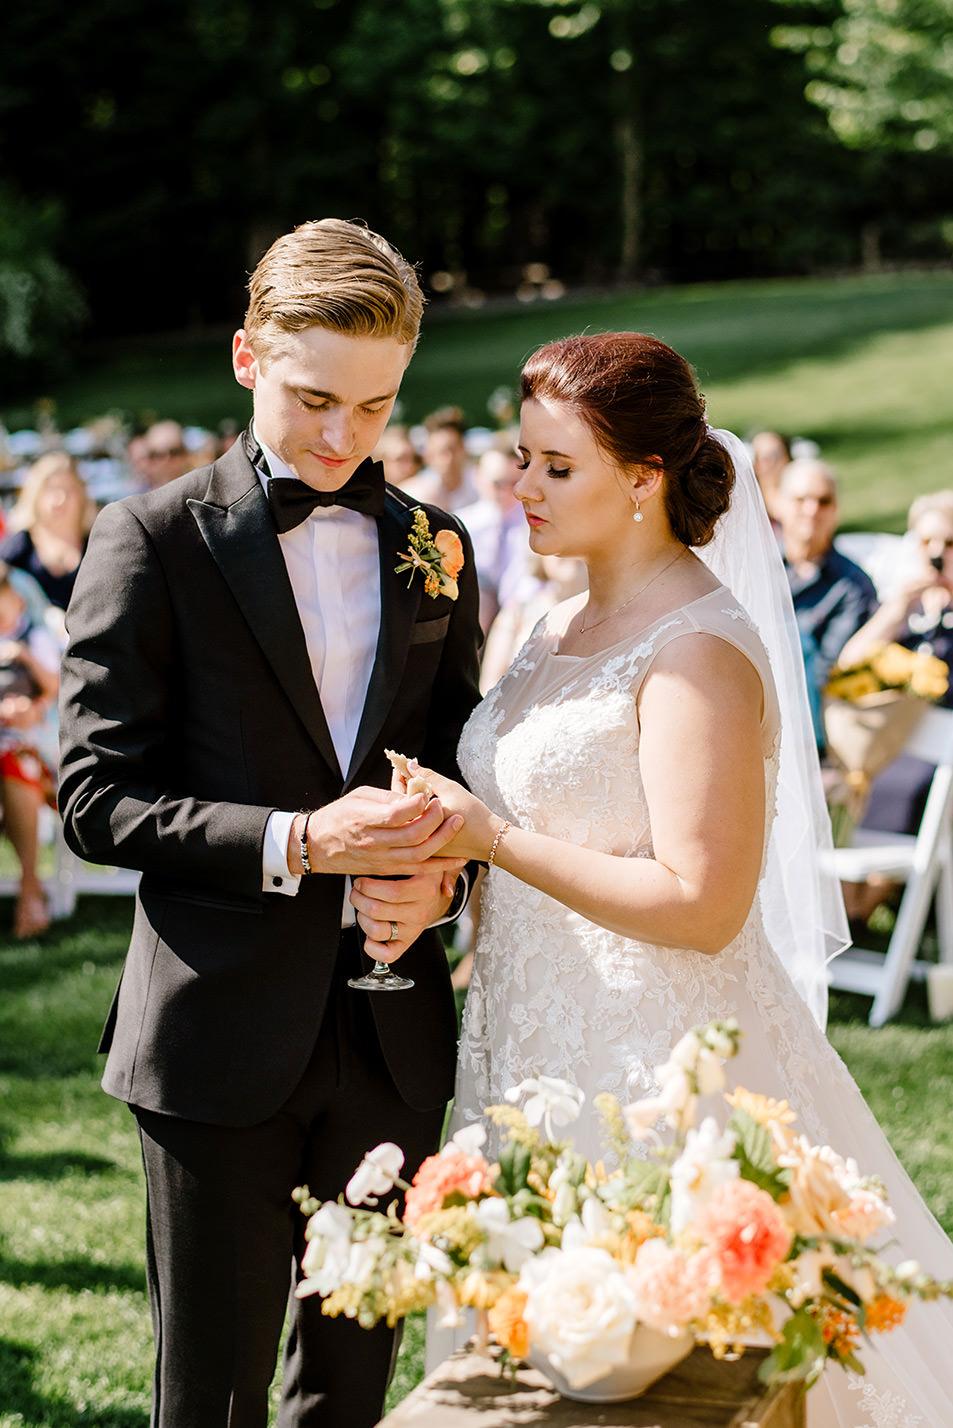 Citrus-inspired-wedding-at-Gorge-Crest-Vineyard-056.jpg